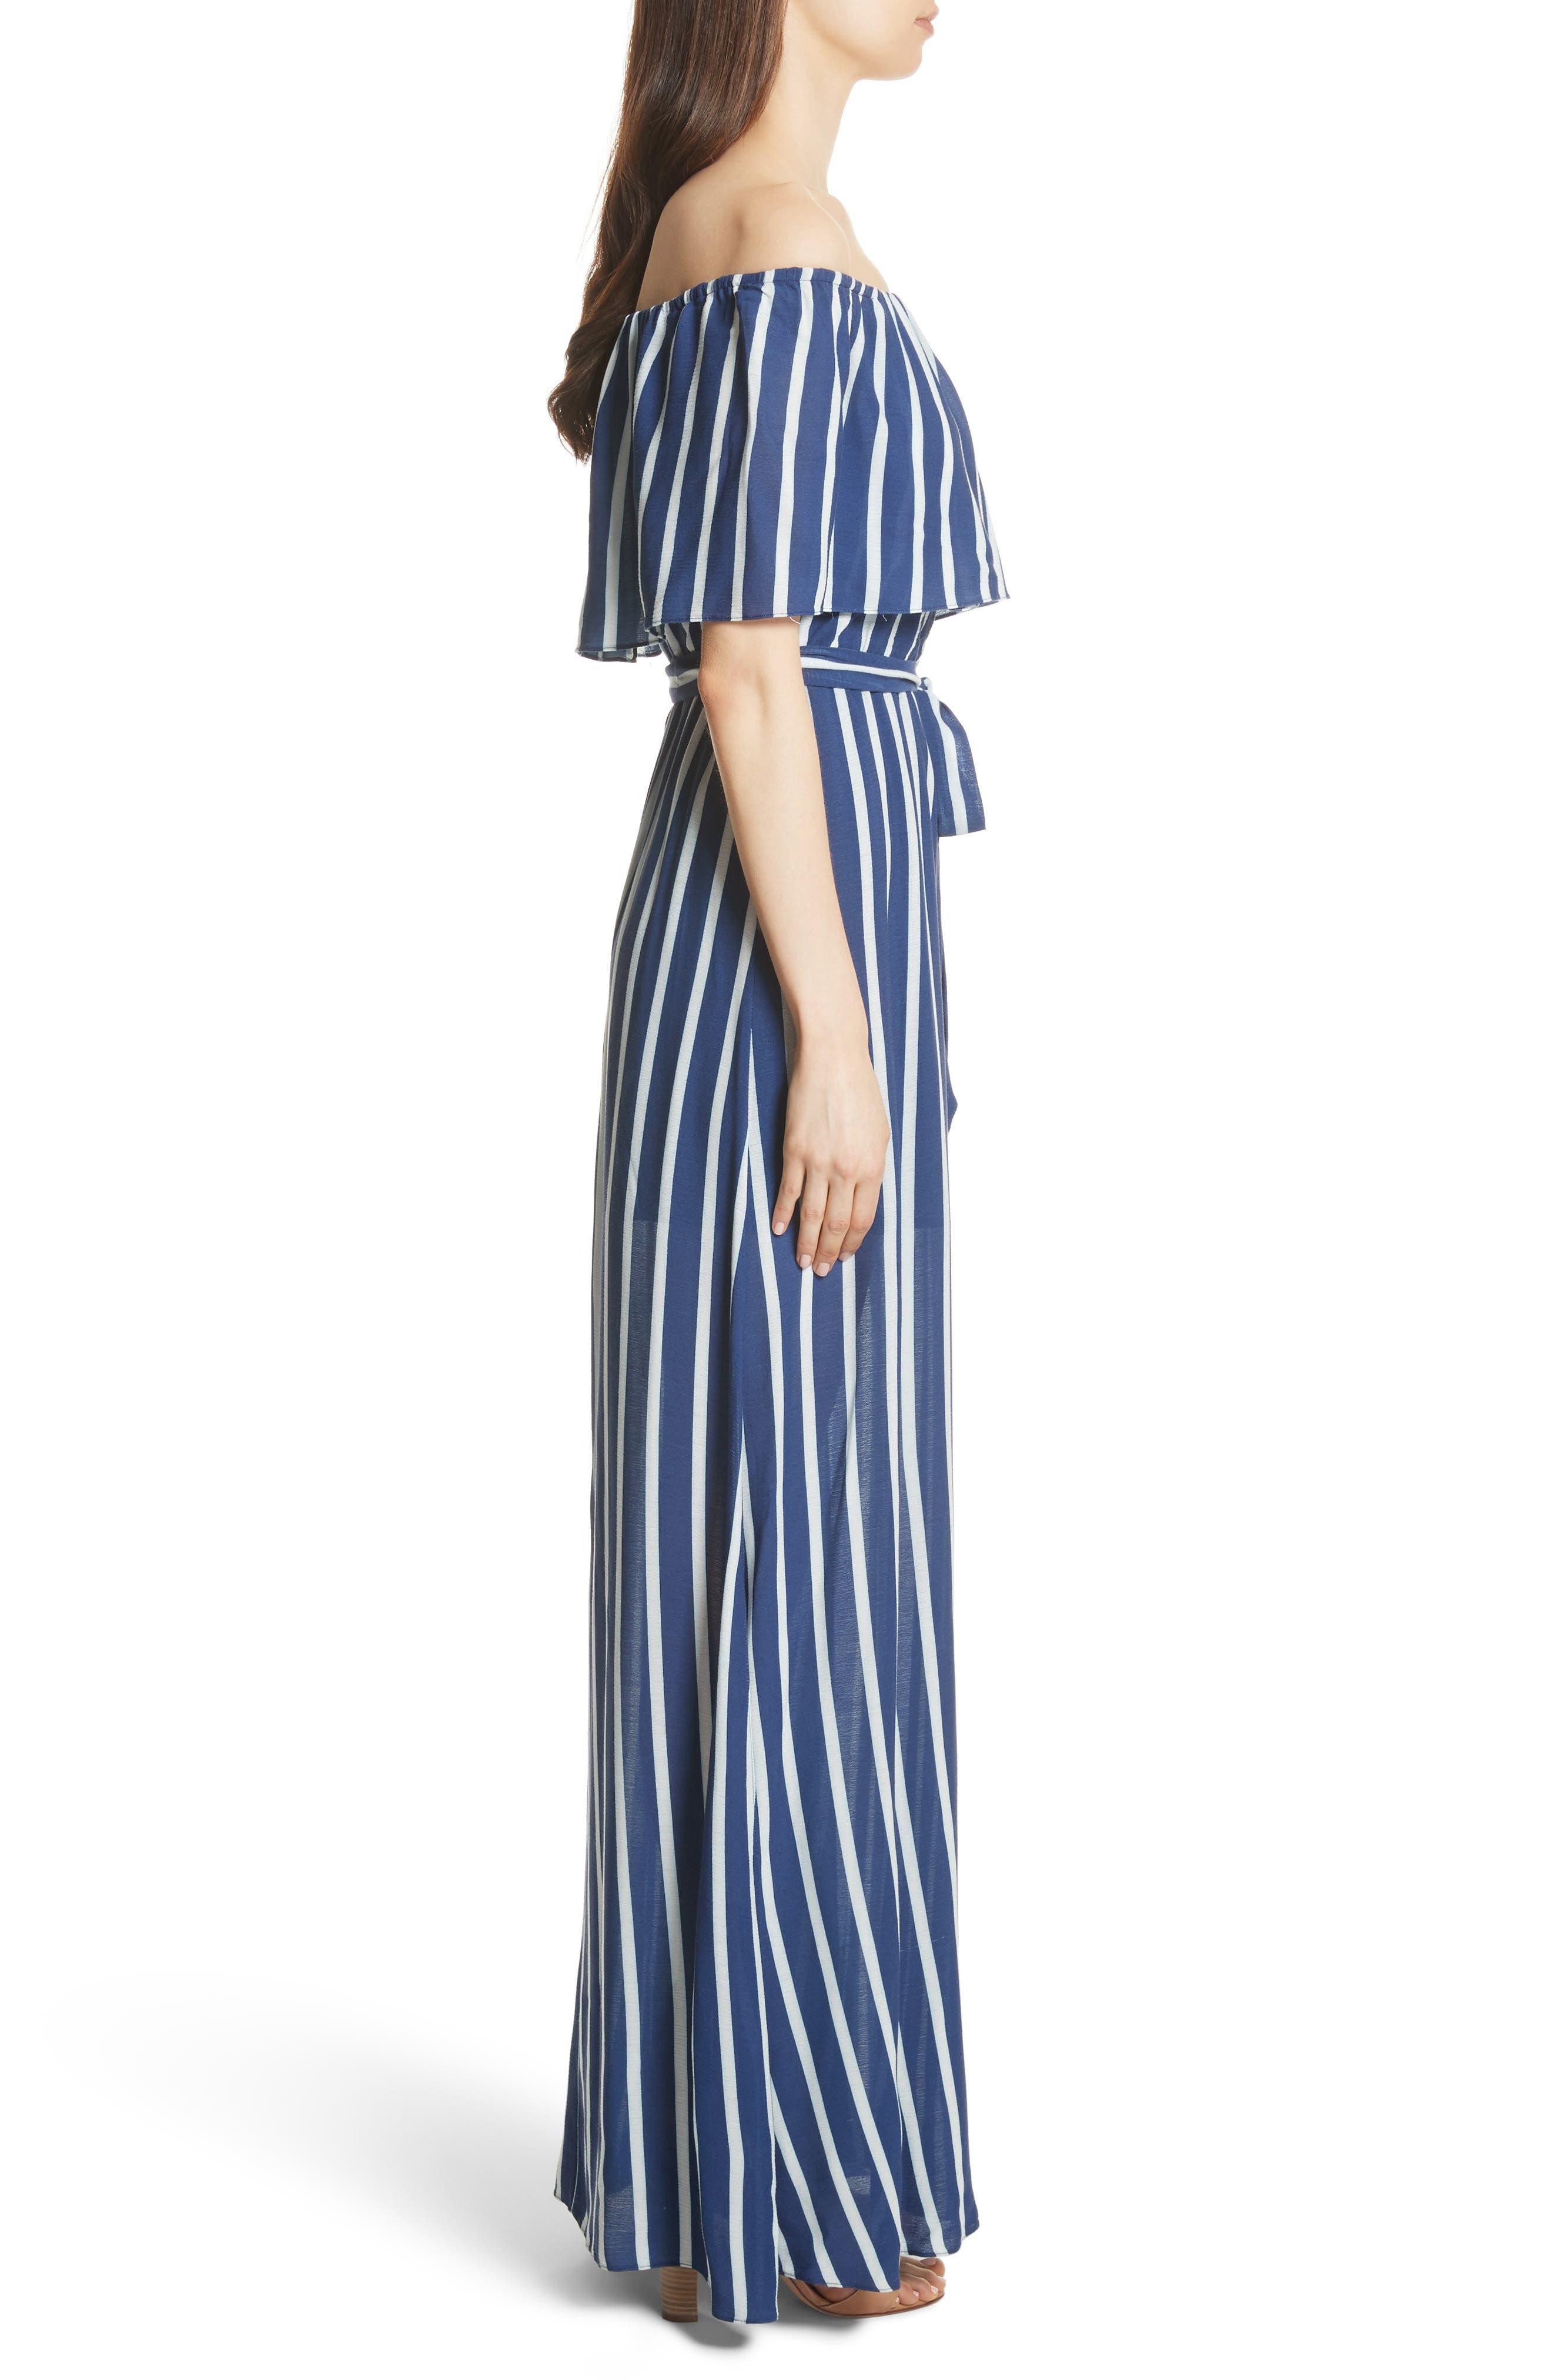 Grazi Off the Shoulder Maxi Dress,                             Alternate thumbnail 3, color,                             Oasis Stripe